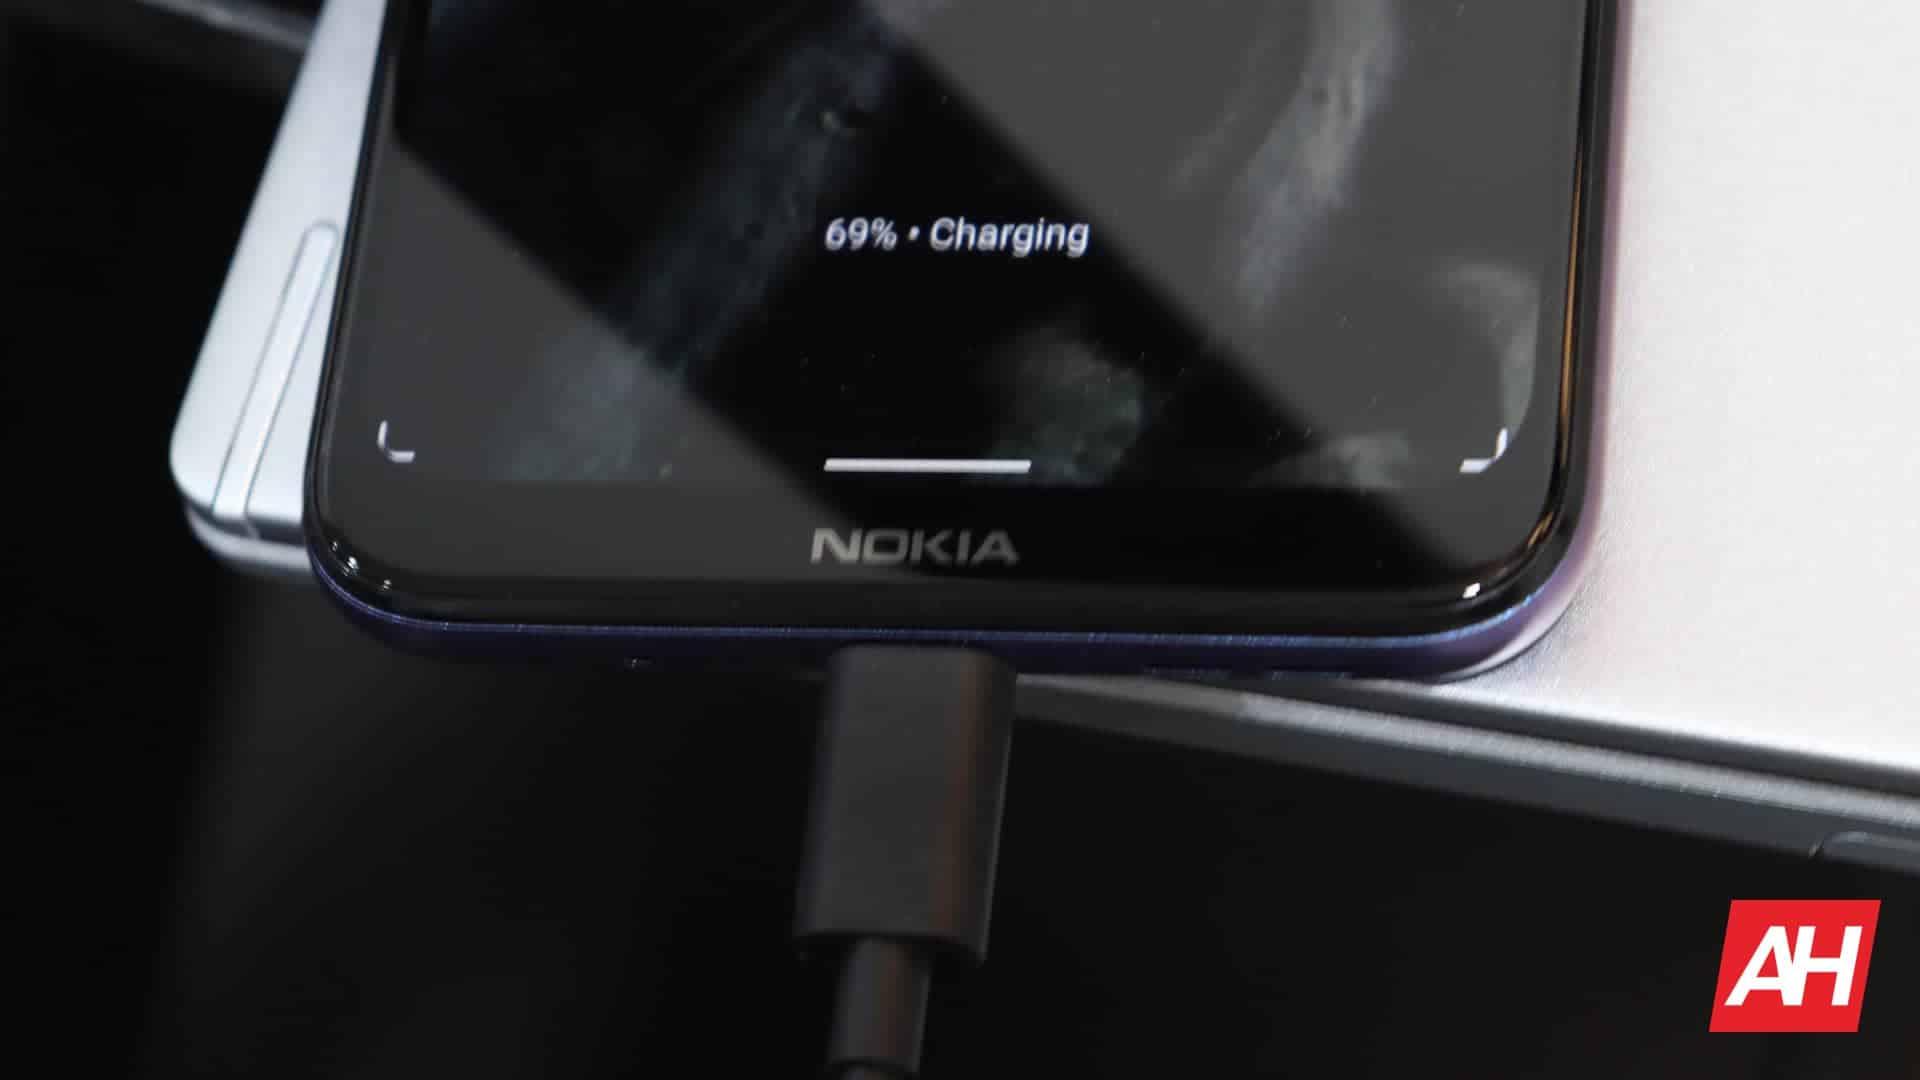 04 Nokia G20 Review battery DG AH 2021